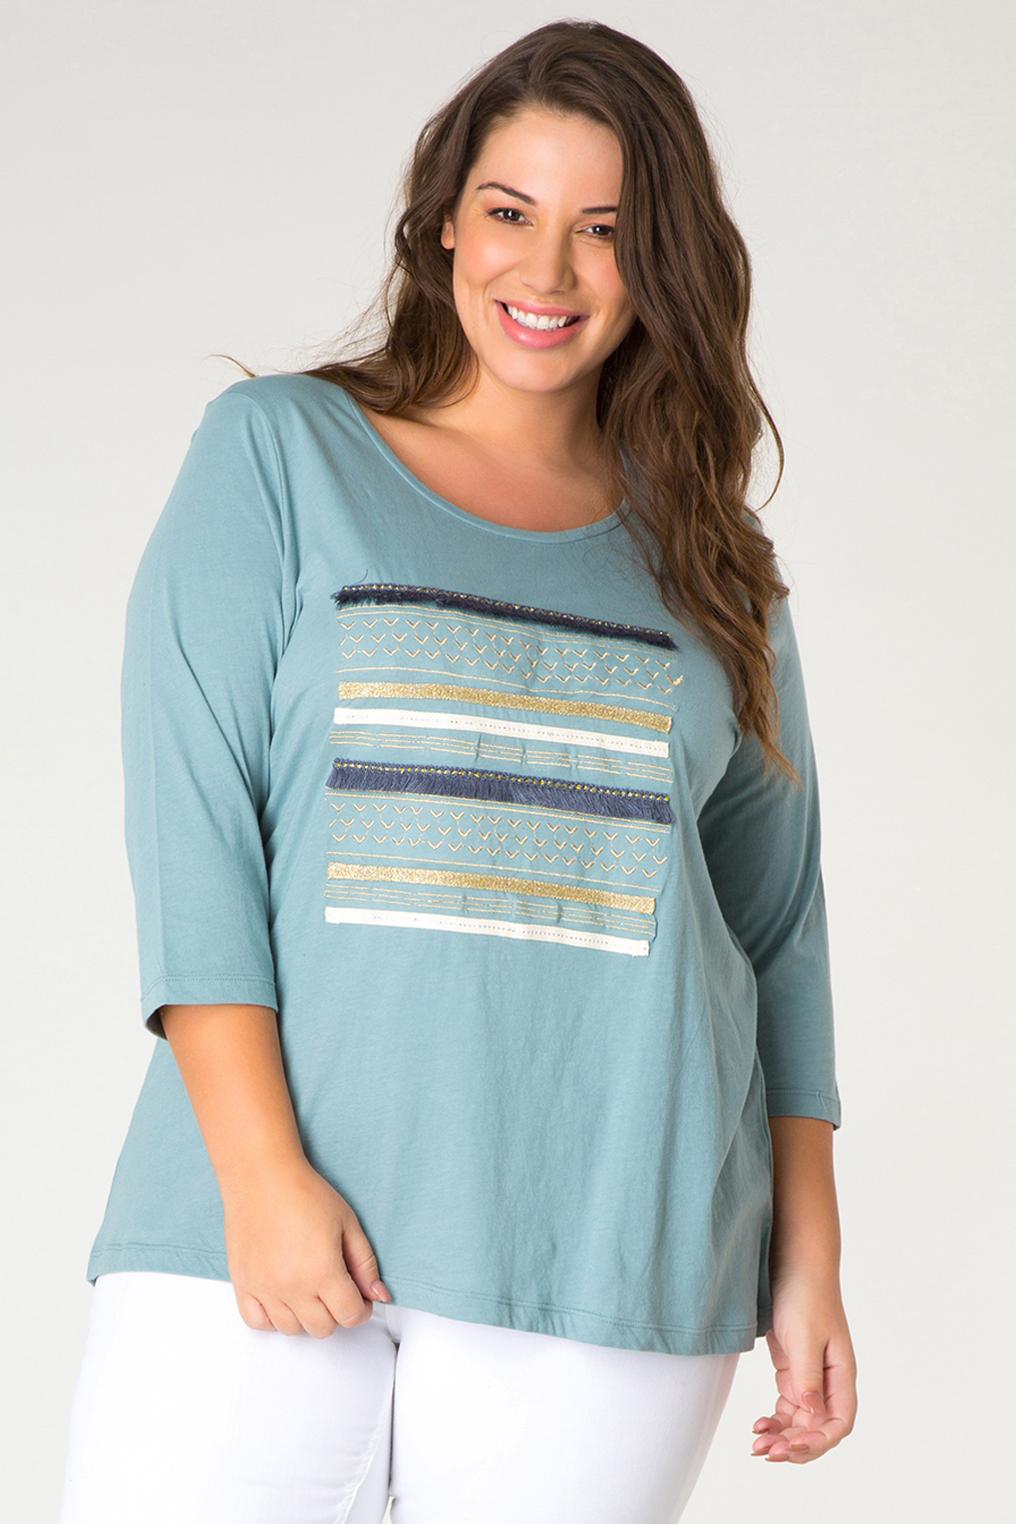 Shirt Gilroy Yesta 64 CM